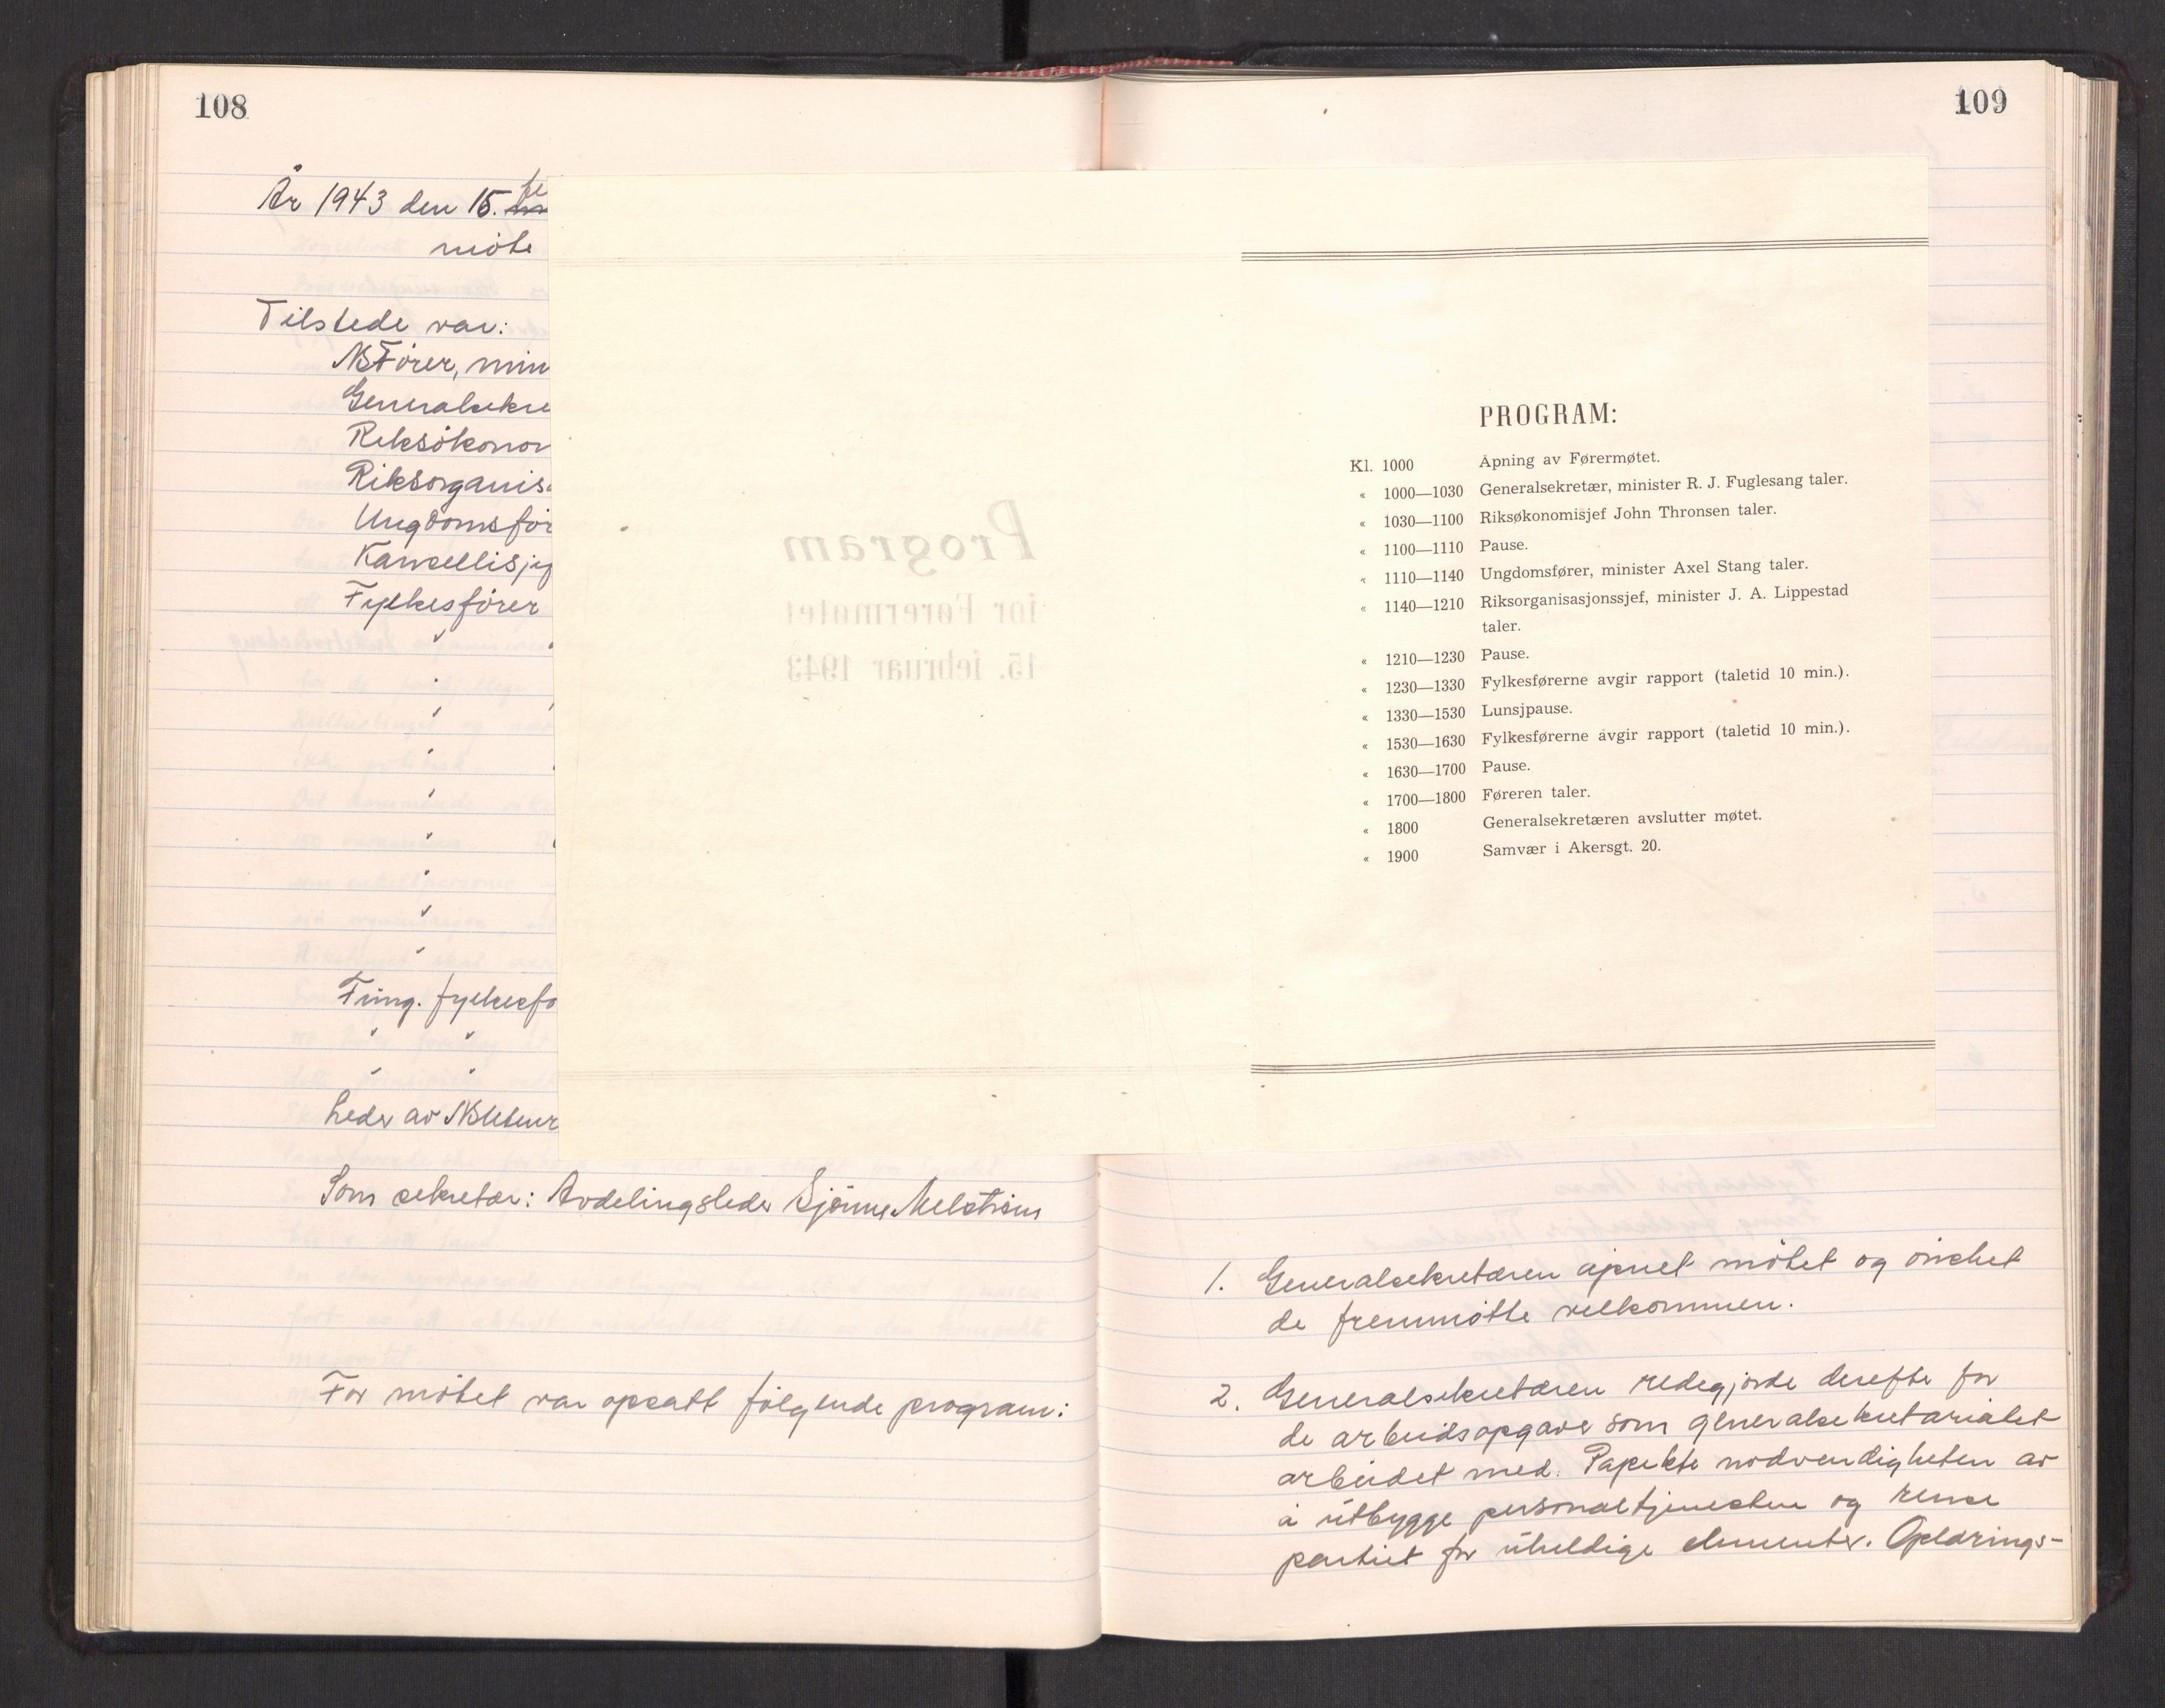 RA, Nasjonal Samling (NS) Generalsekretariat, A/L0117: NS Riks- og Rådsmøteprotokoll, 1934-1945, s. 108-109